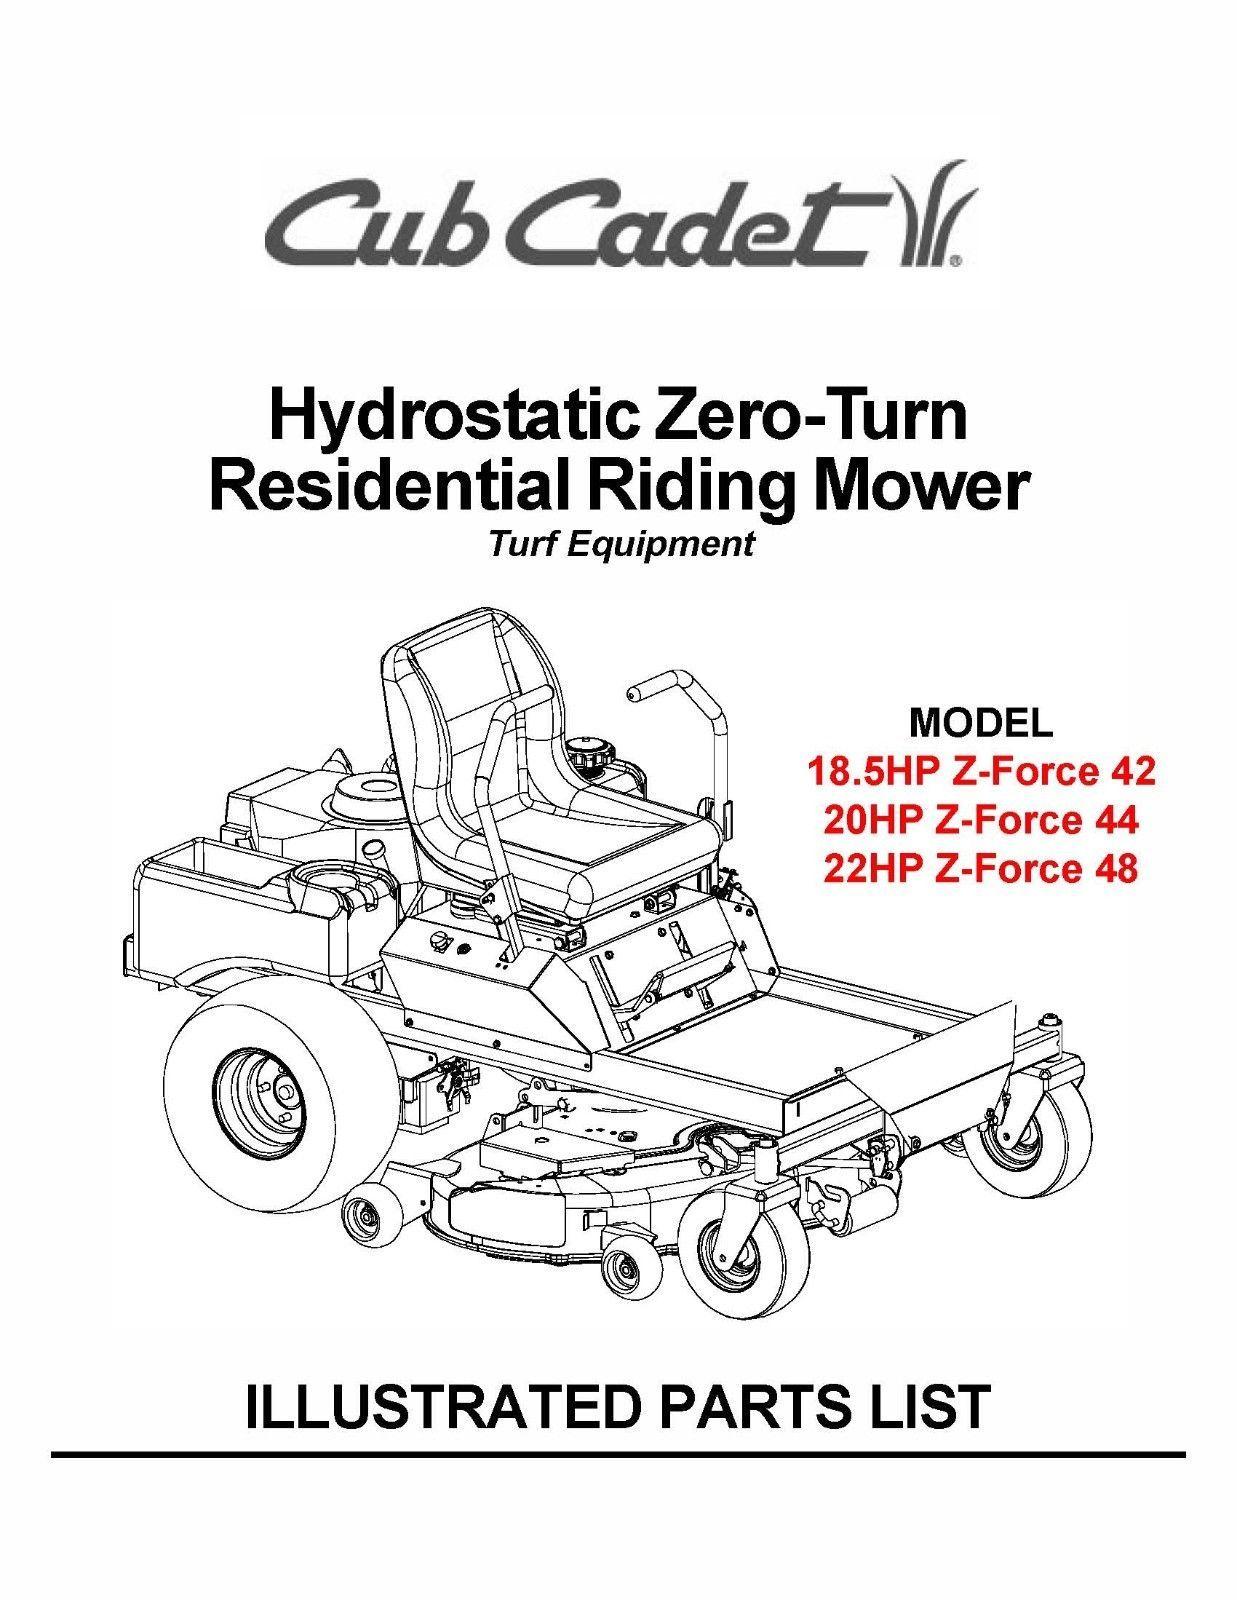 Cub Cadet Hydrostatic Zeroturn Riding Mower And 47 Similar